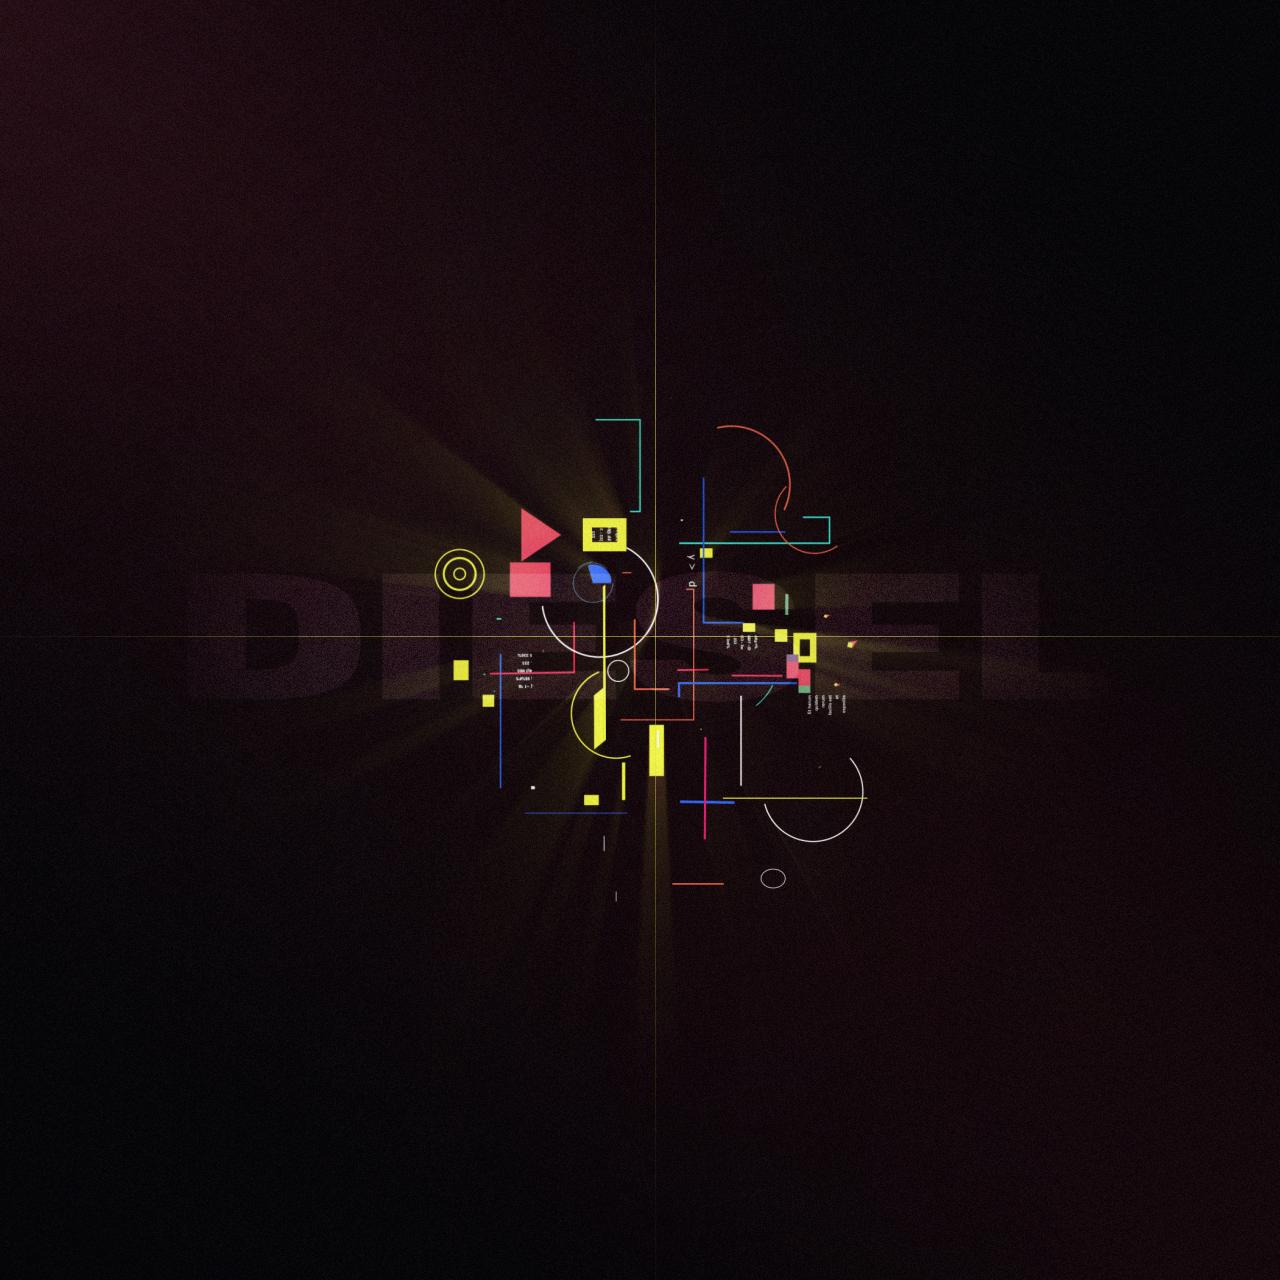 Deisel_Still Comp 1 (0079).png